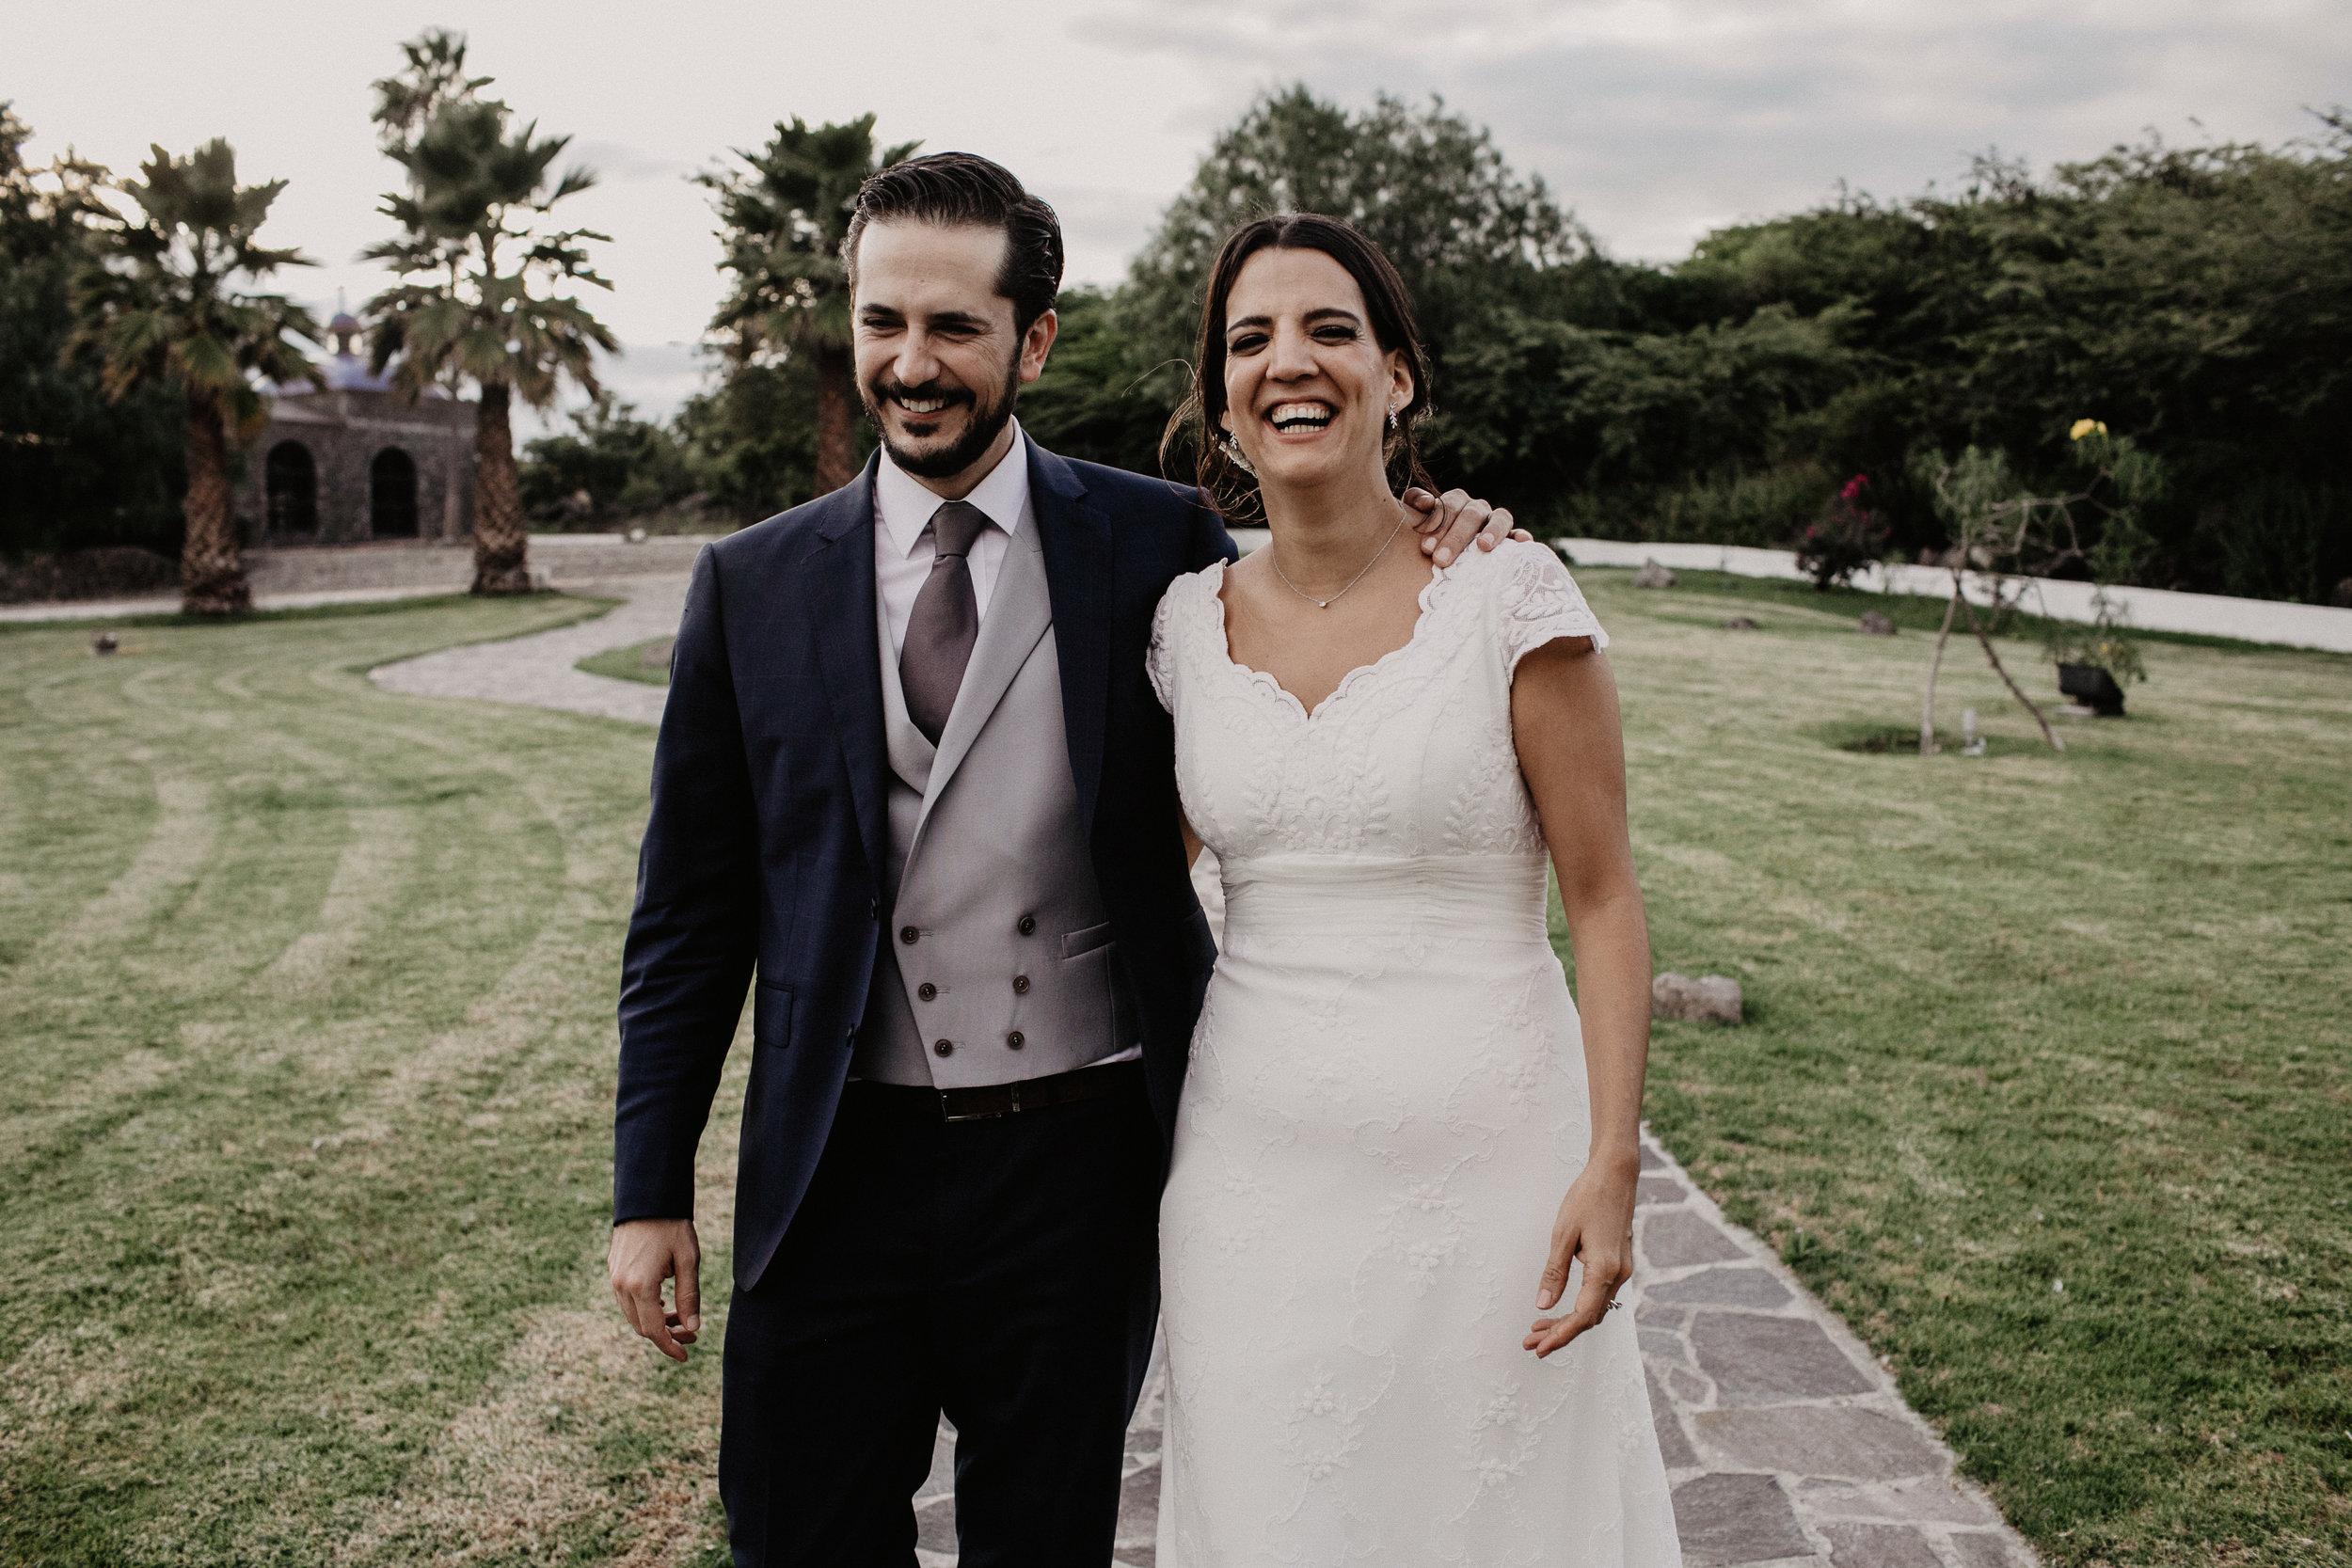 alfonso_flores_destination_wedding_photographer_pau_alonso_1020.JPG